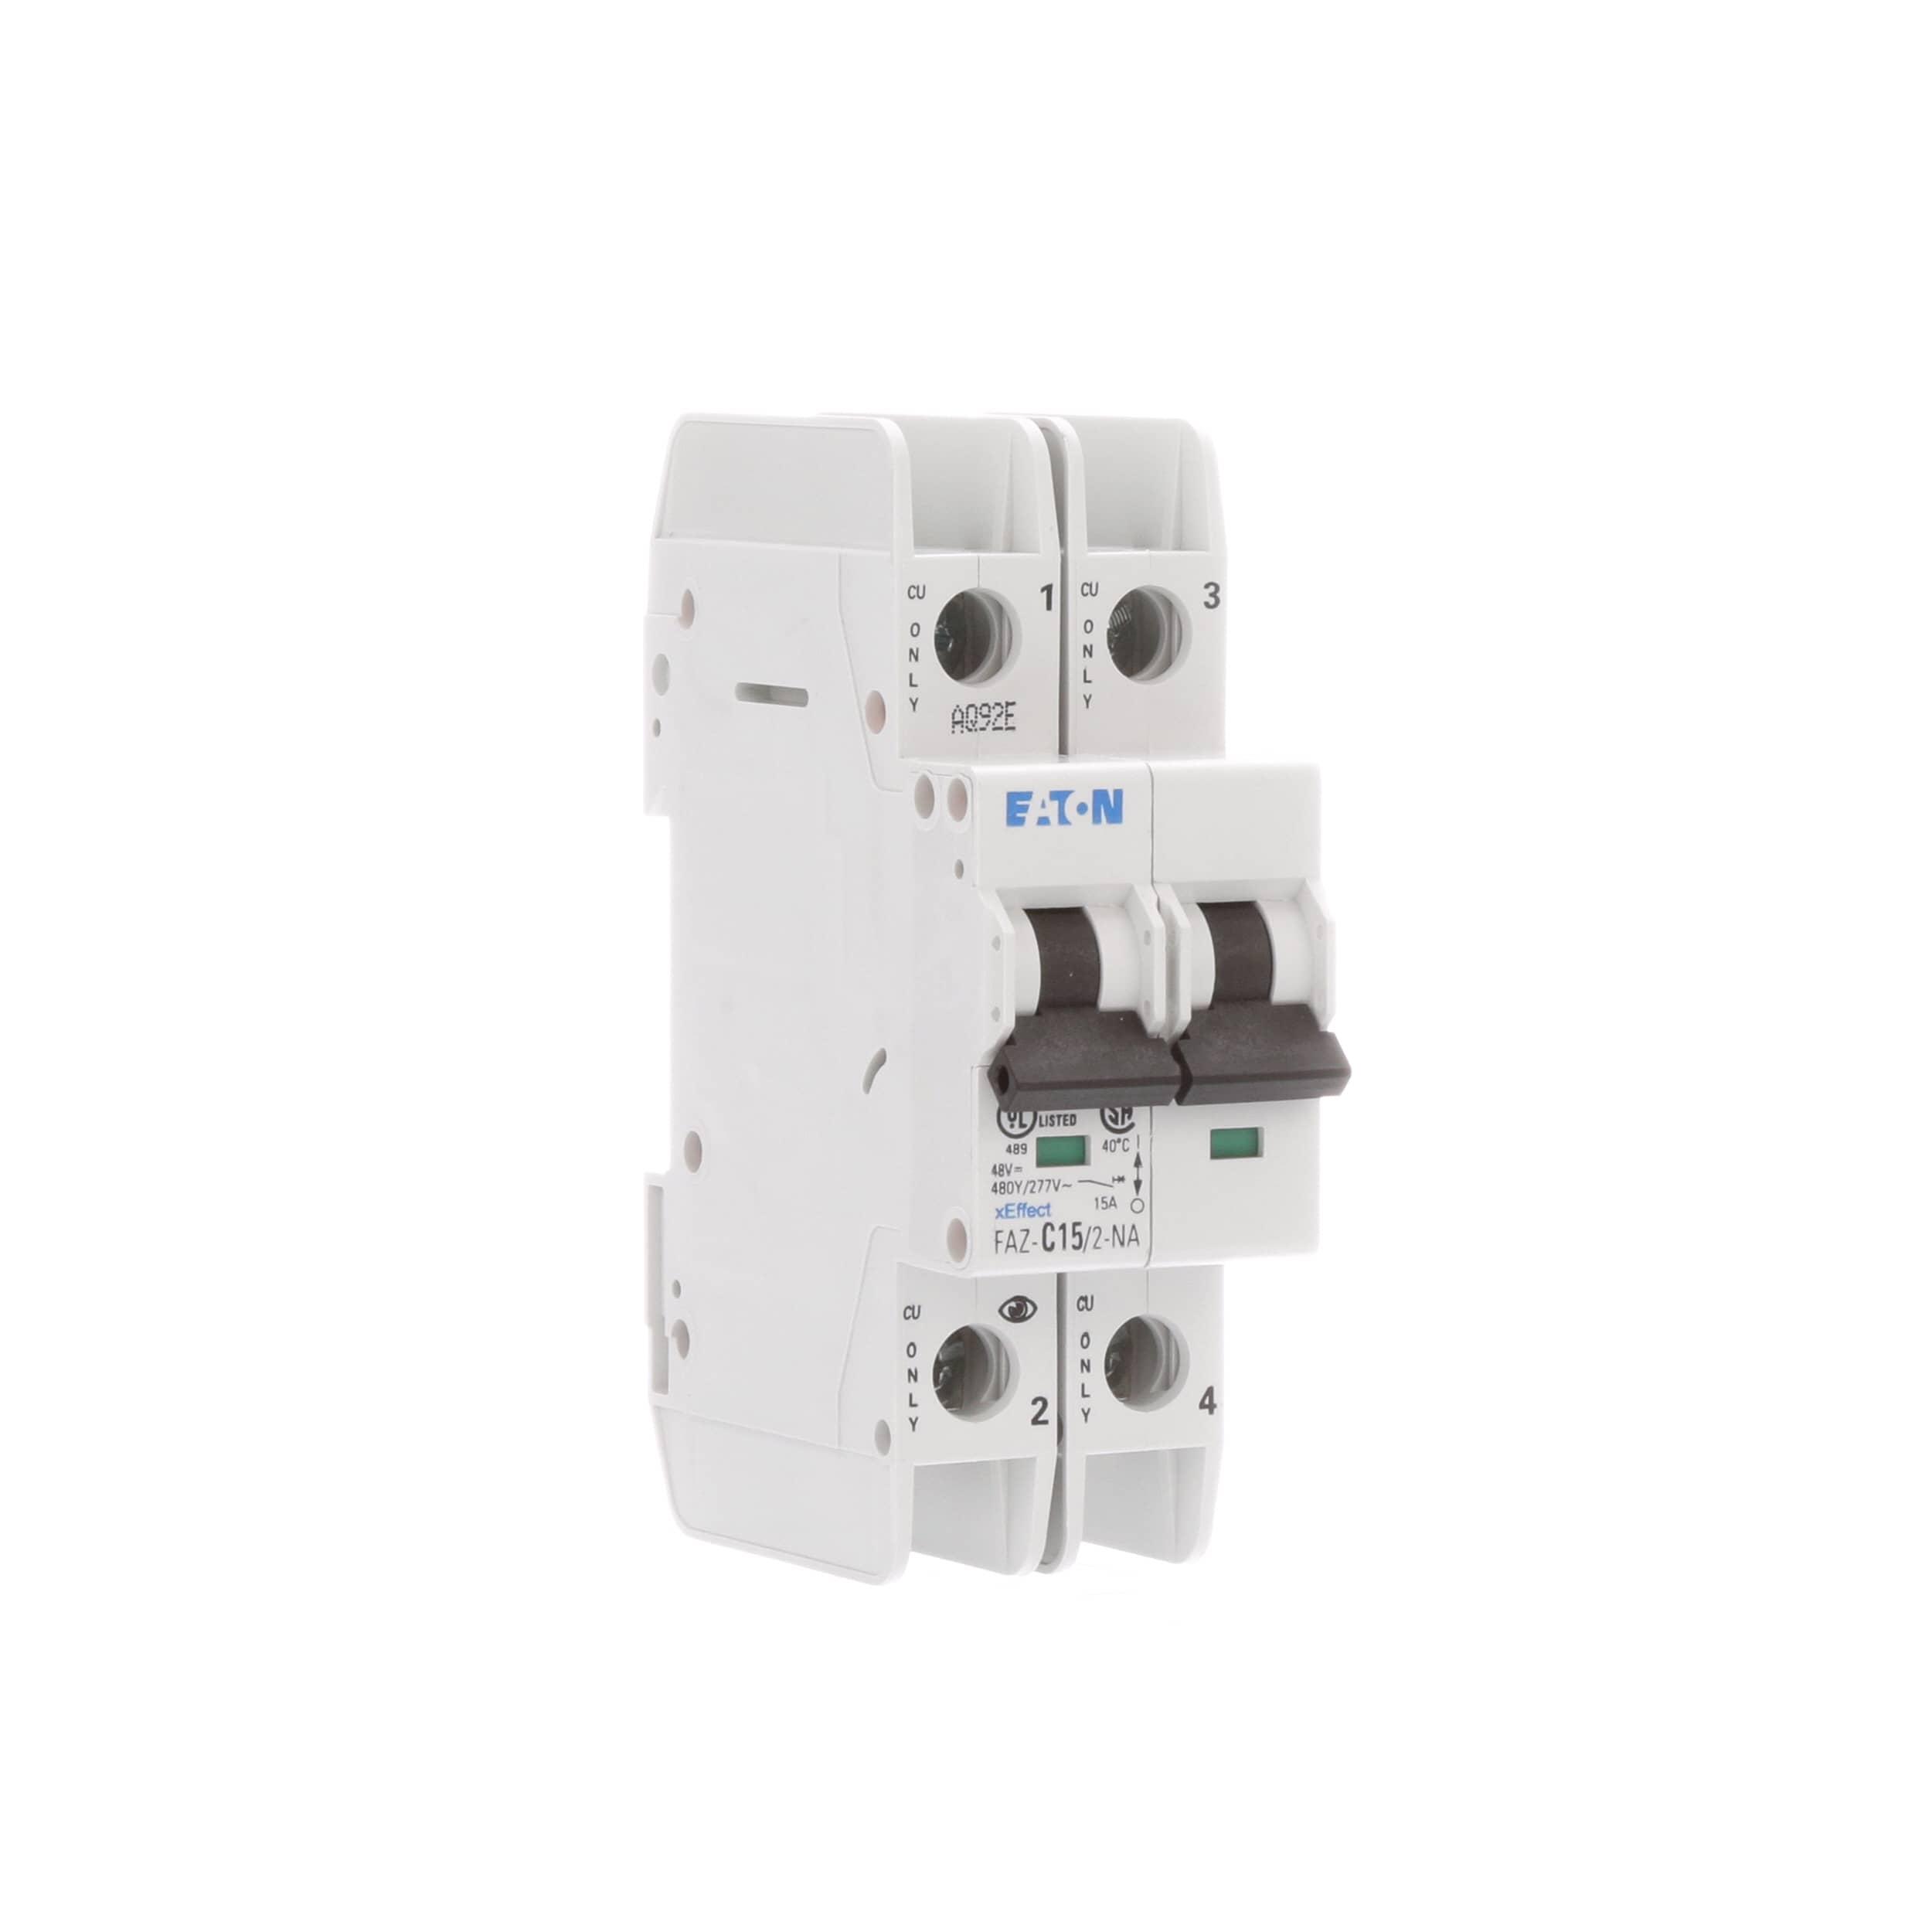 Eaton Cutler Hammer Faz C15 2 Na Circuit Breaker Logic In Power Plant Supplementary C Curve 15a Pole Std Pkg Ul 489 Screw Allied Electronics Automation